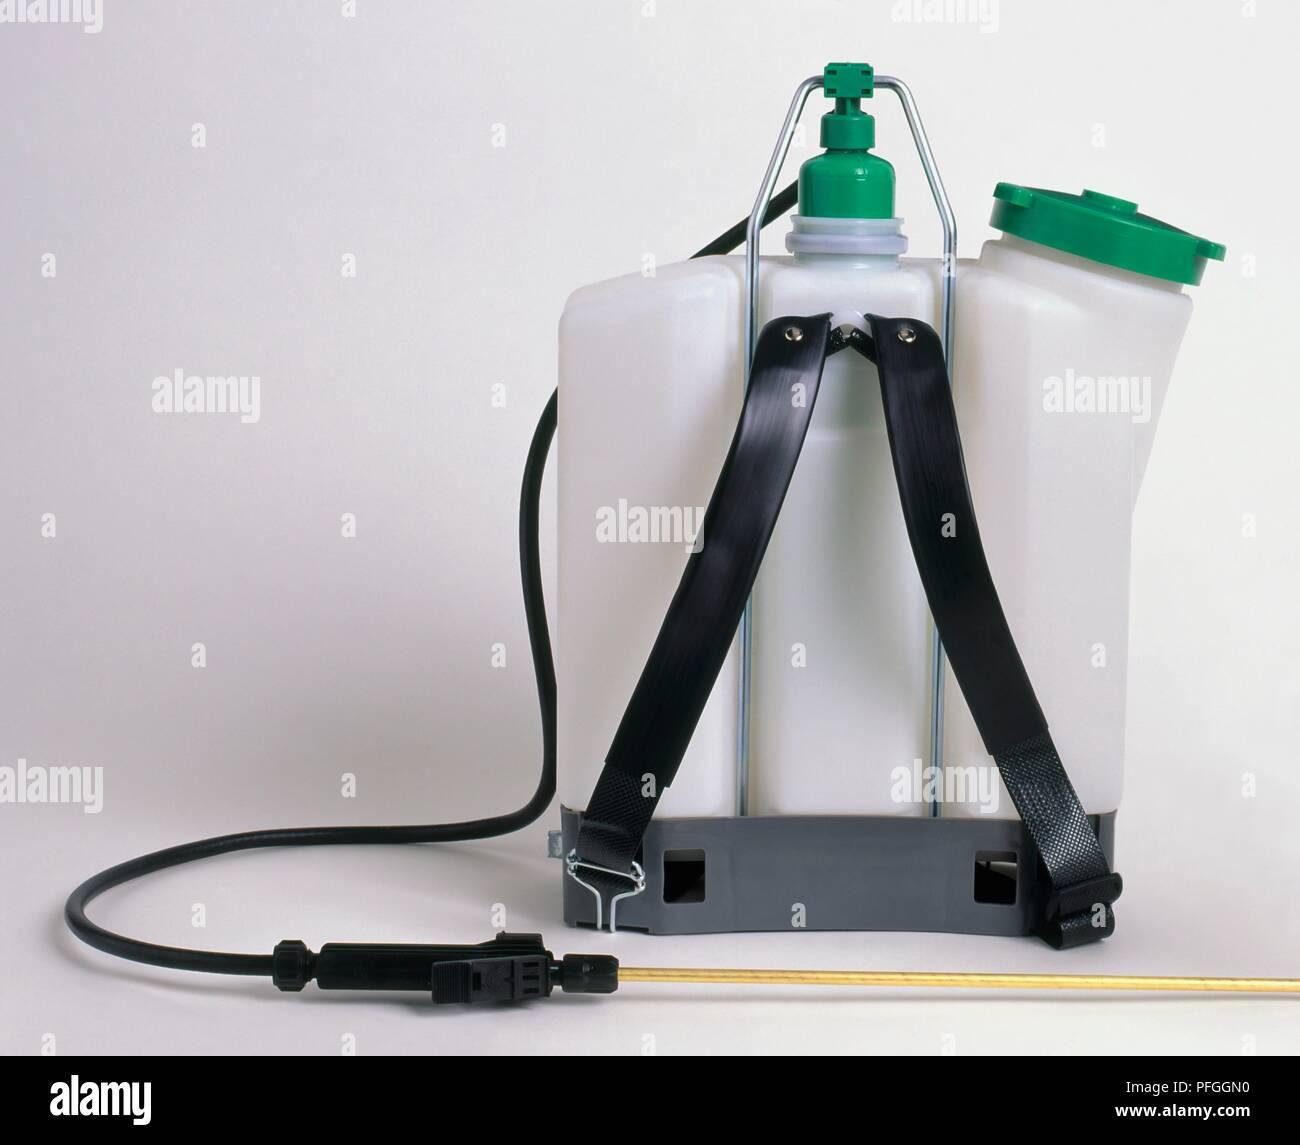 Knapsack Spraying Stock Photos & Knapsack Spraying Stock Images - Alamy